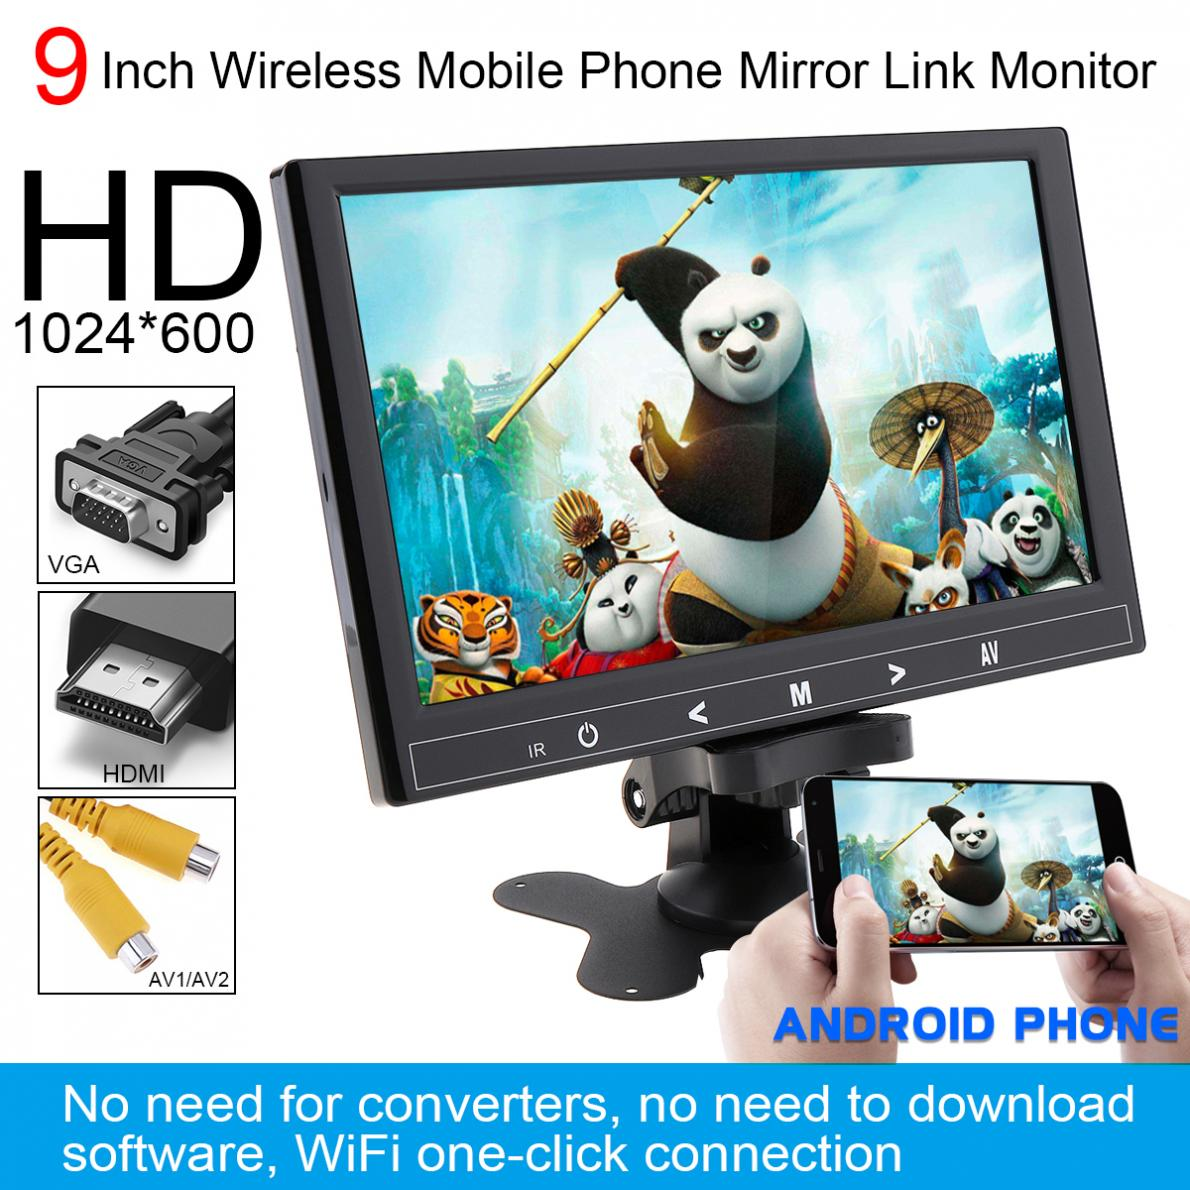 9 Inch 12V IPS 1024*600 TFT LCD Universal Car Headrest Monitor Support HDMI/VGA/AV/Wireless Mobile Phone Mirror Link цена 2017